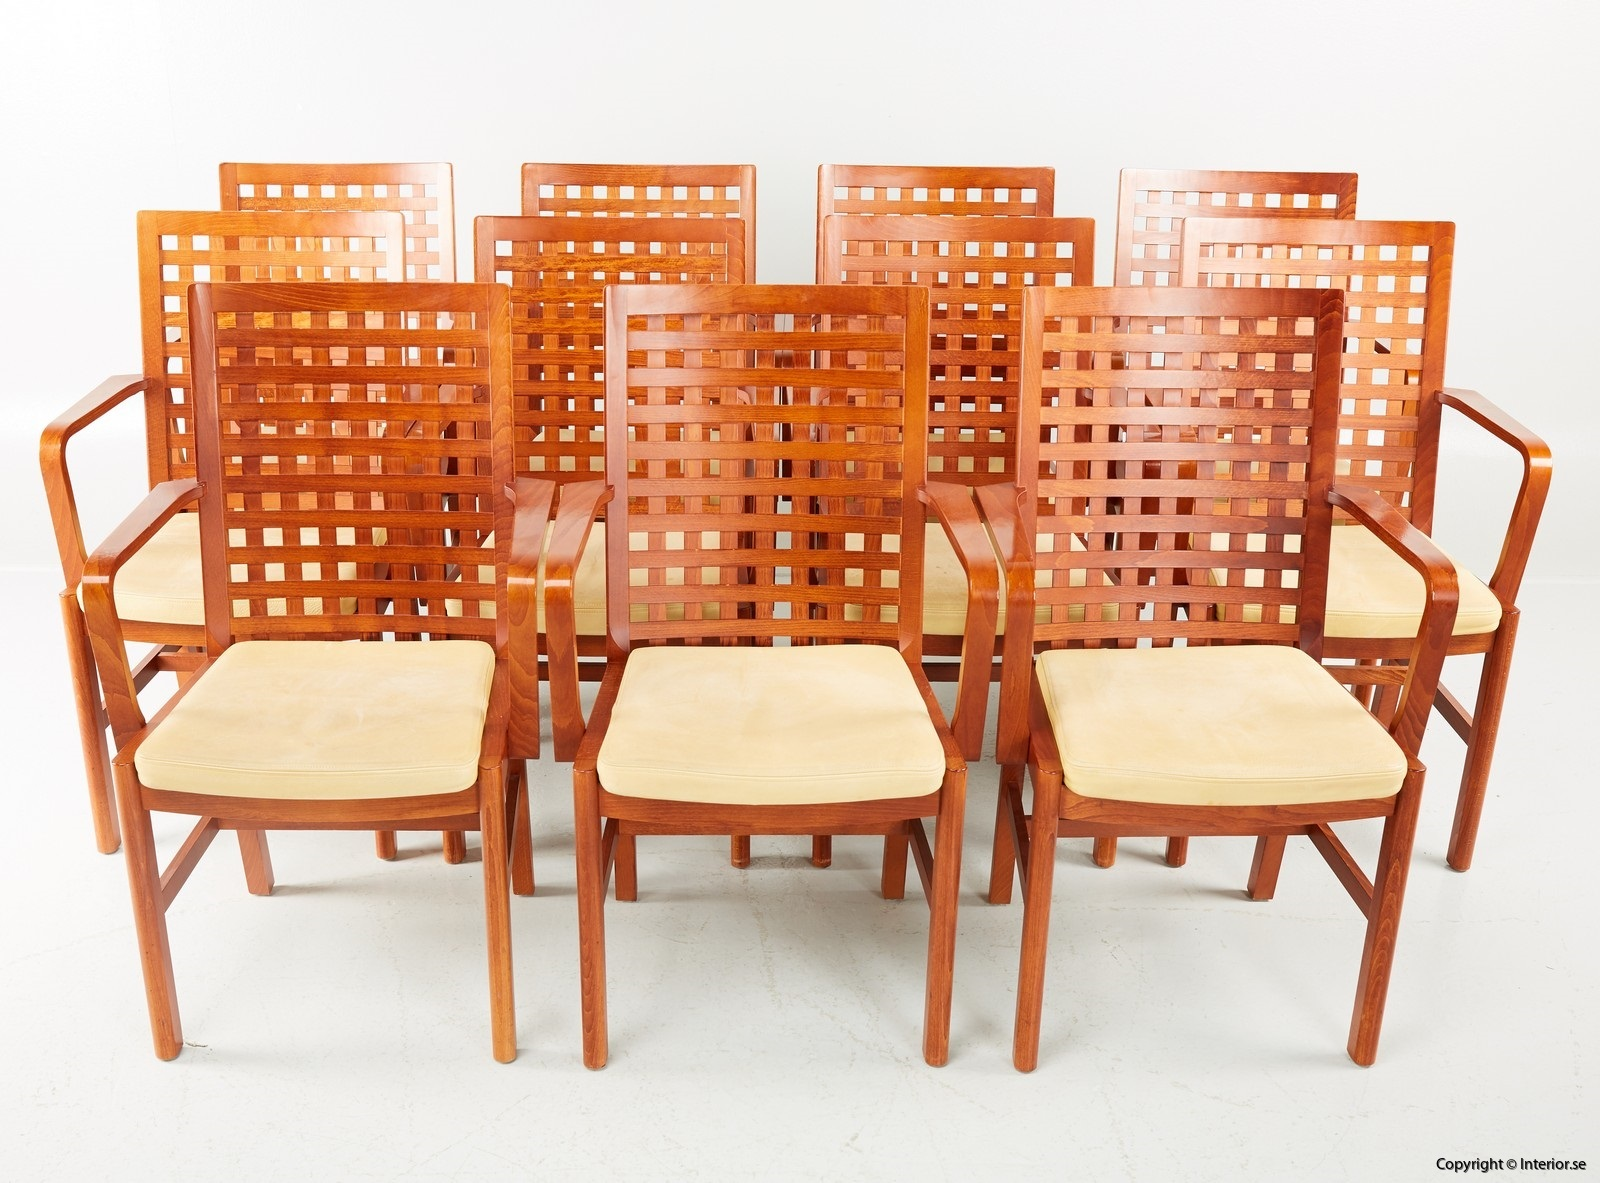 1 Konferensstolar Conference Chairs, Kvist Industries - Lädersits - Design furniture (3)